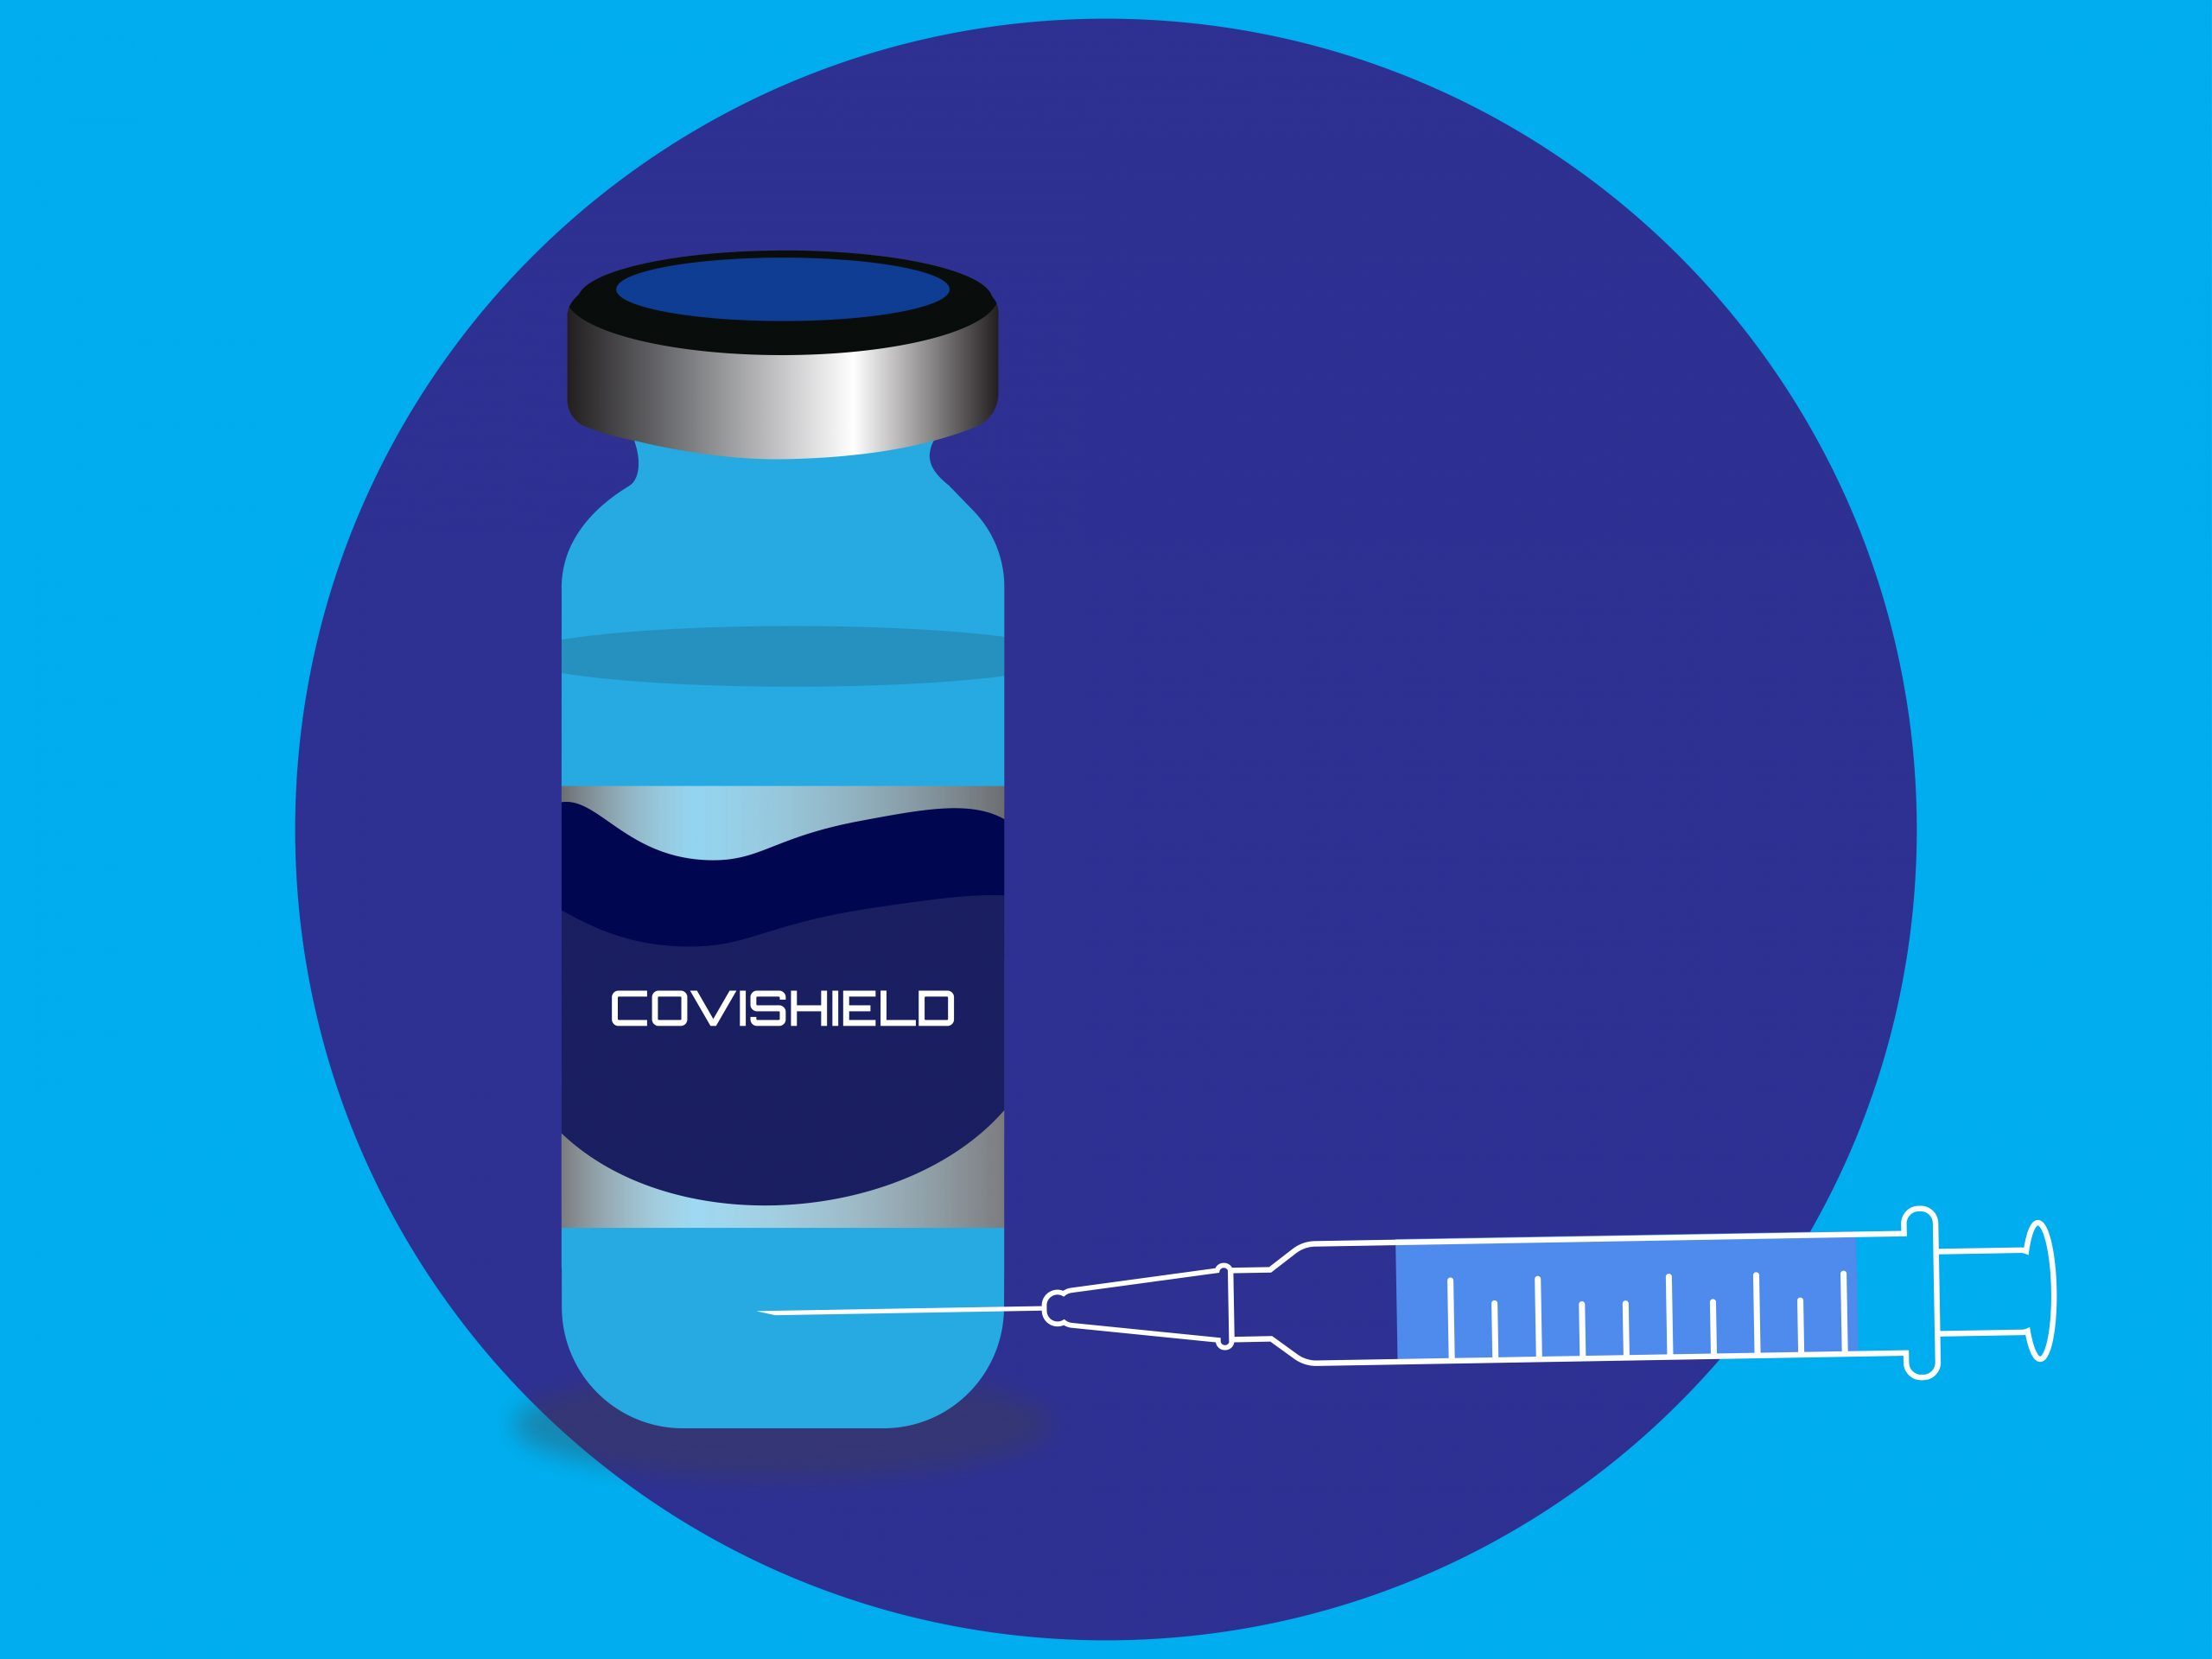 Covishield-vaccine-illustration